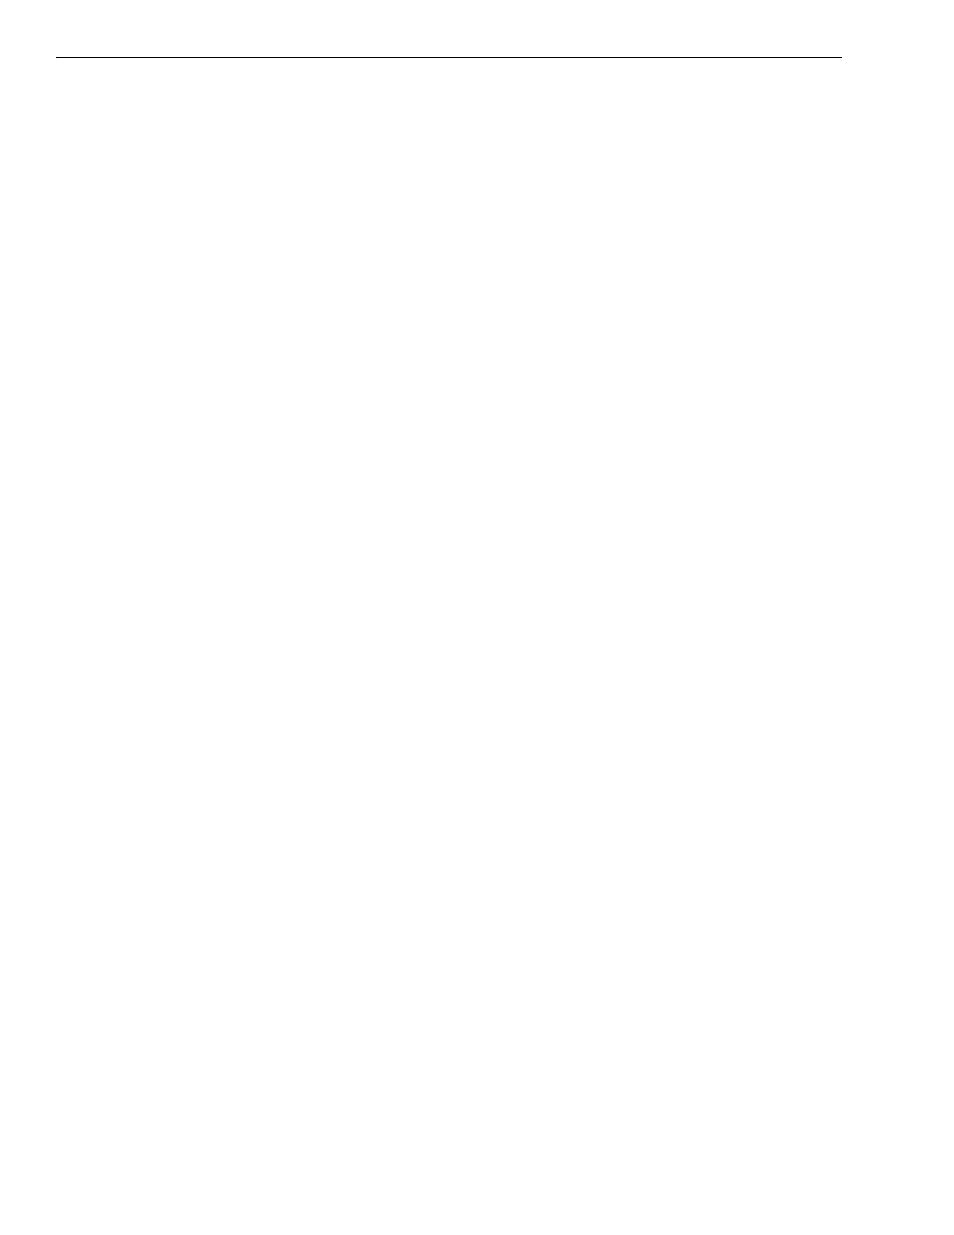 Rear oscillation lock system | Lull 6K Service Manual User Manual | Page  520 / 636